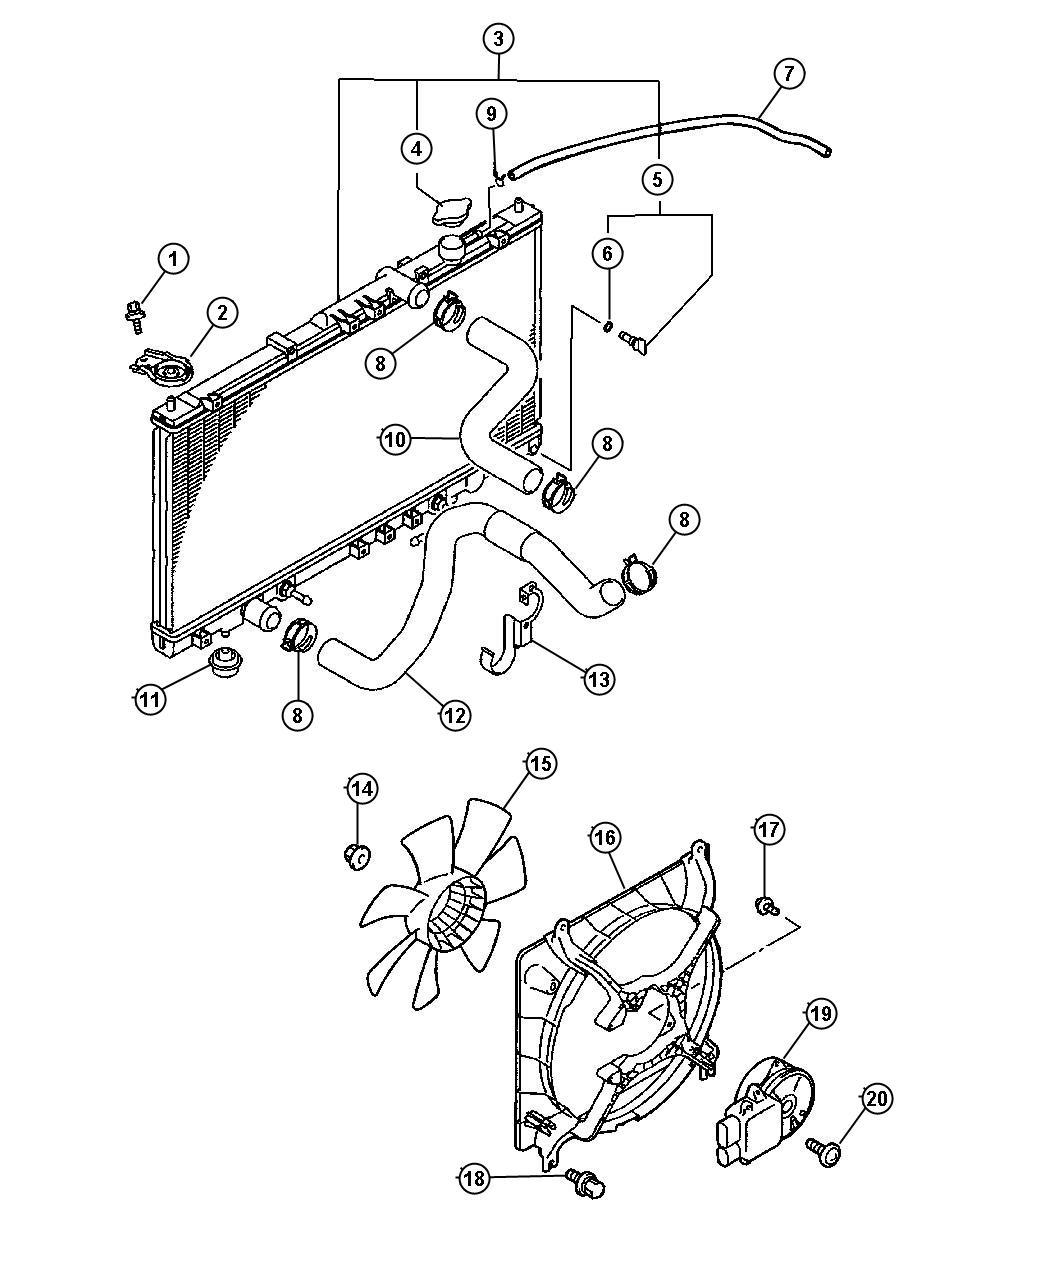 chevy w4500 wiring diagram